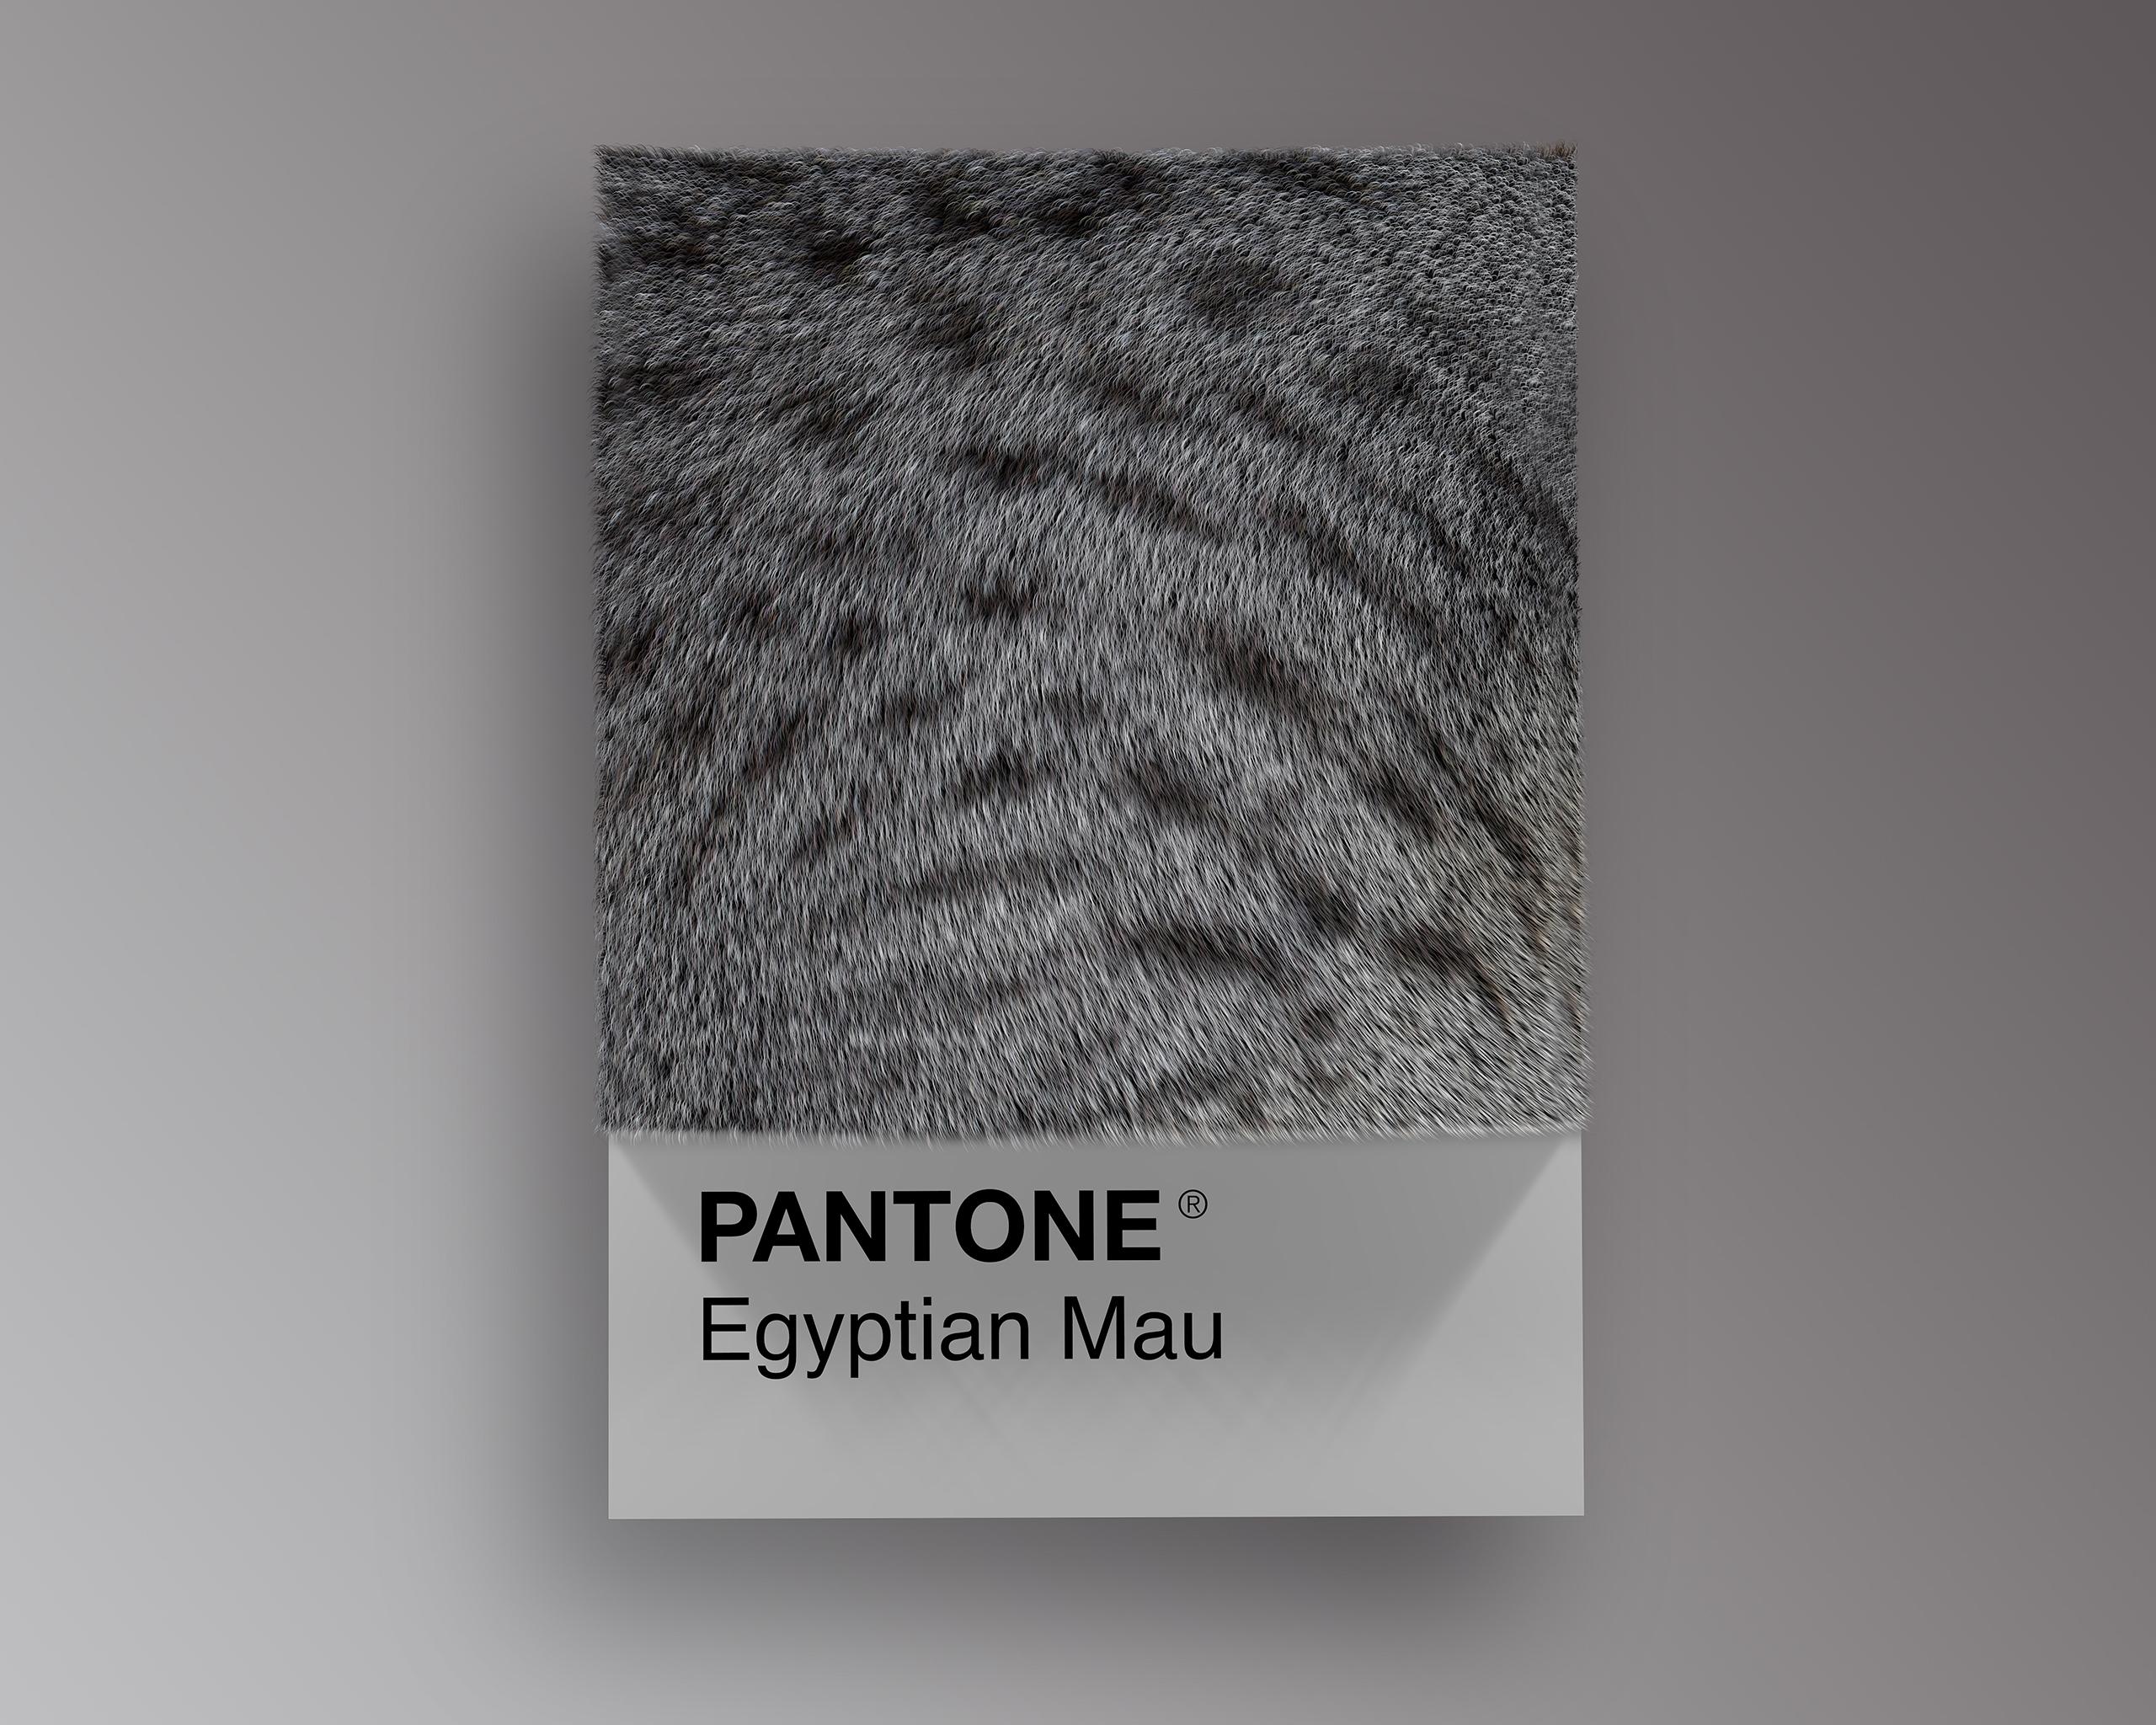 Egyptian Mau as Pantone